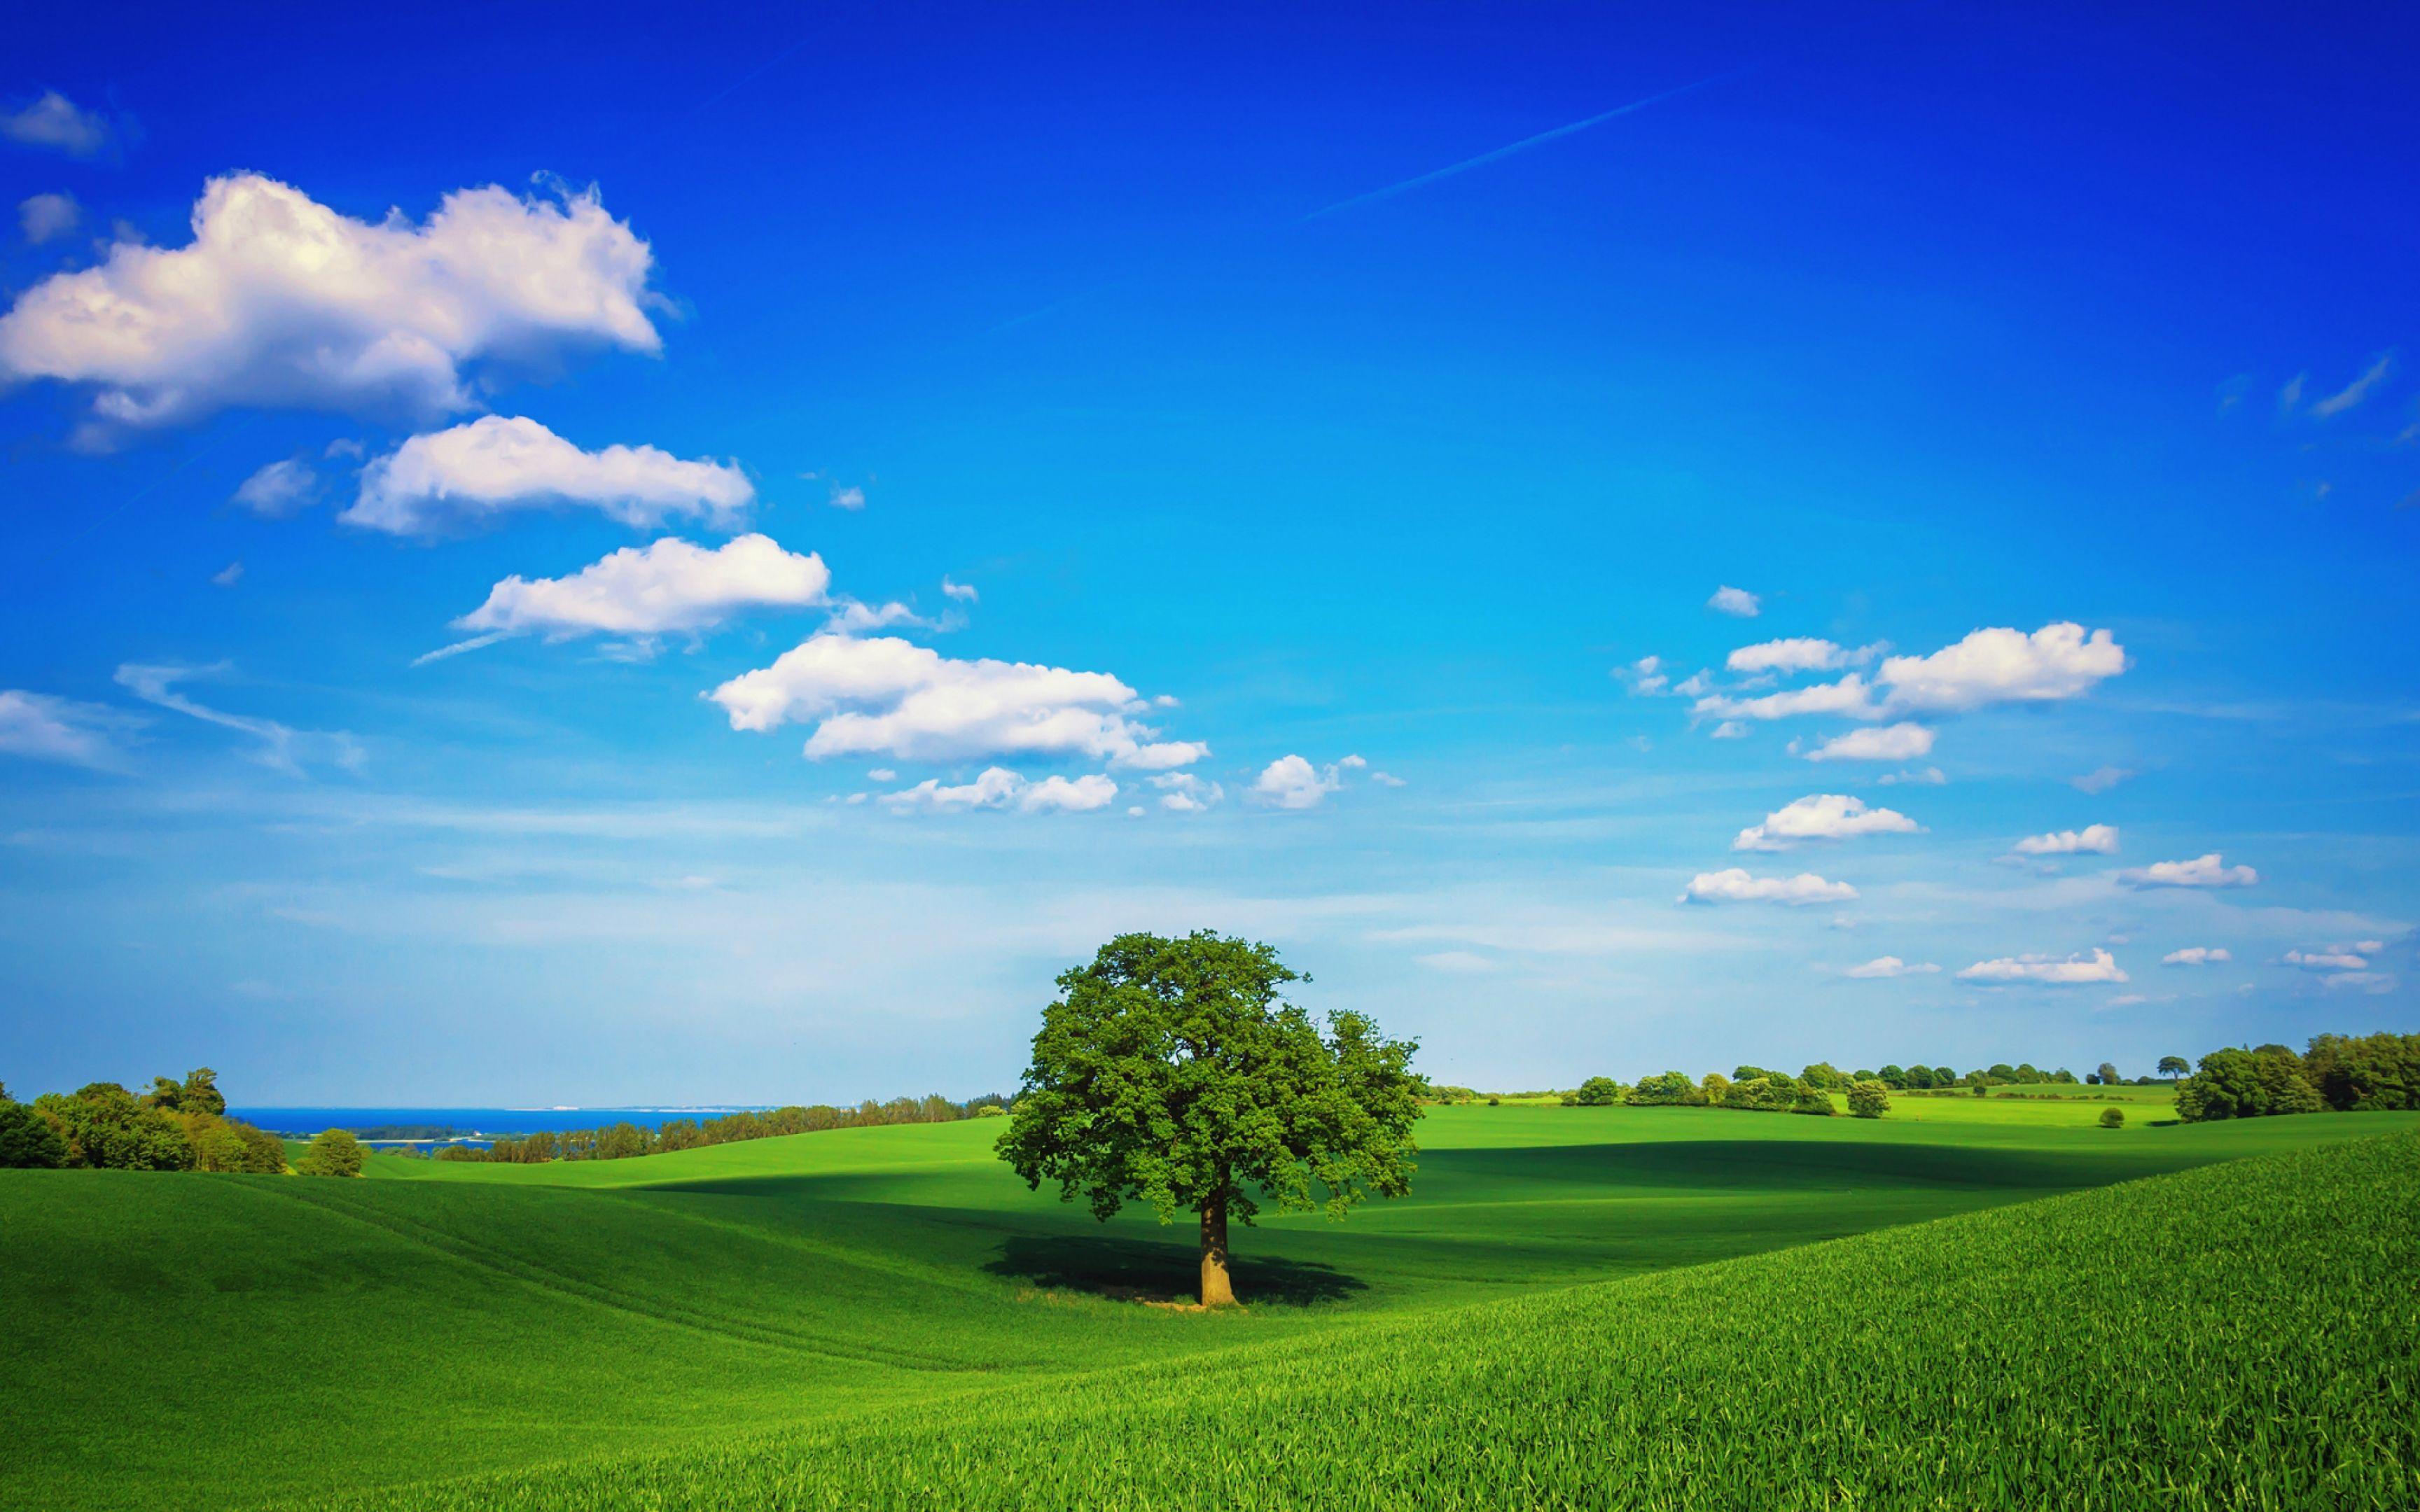 4k Sky Wallpapers Top Free 4k Sky Backgrounds